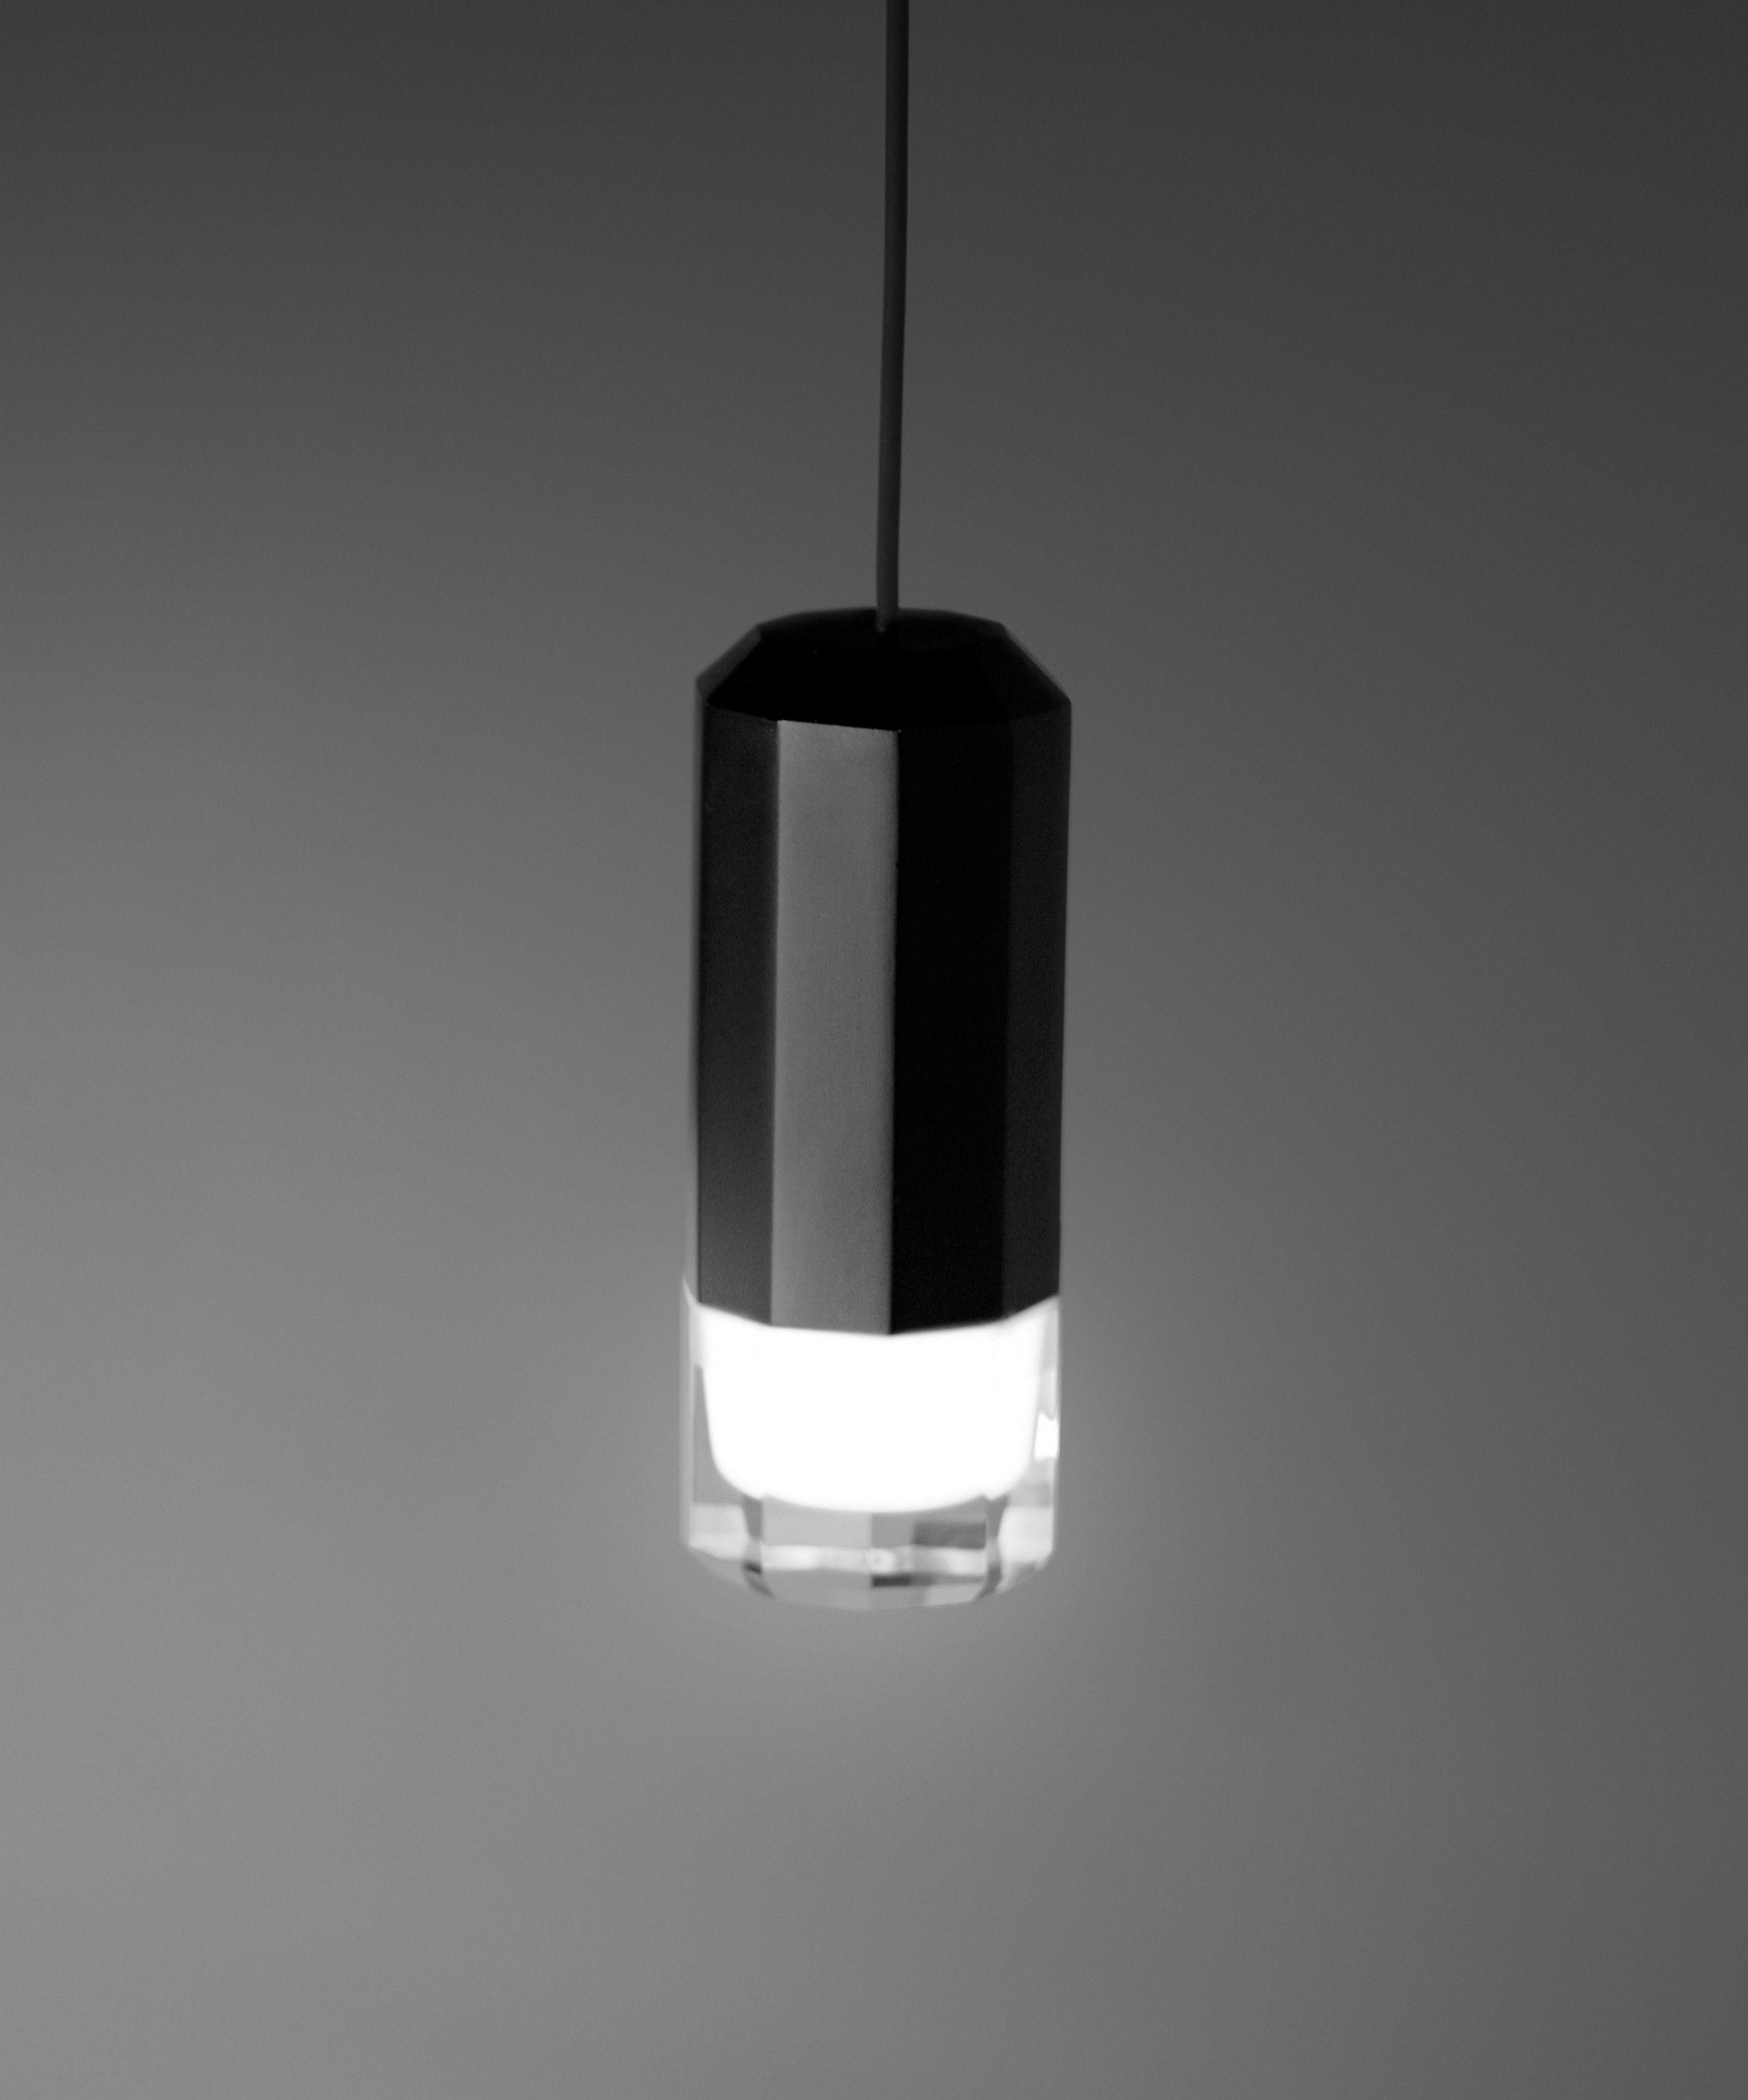 WIREFLOW Designer Arik Levy Manufacturers Vibia lighting Lighting